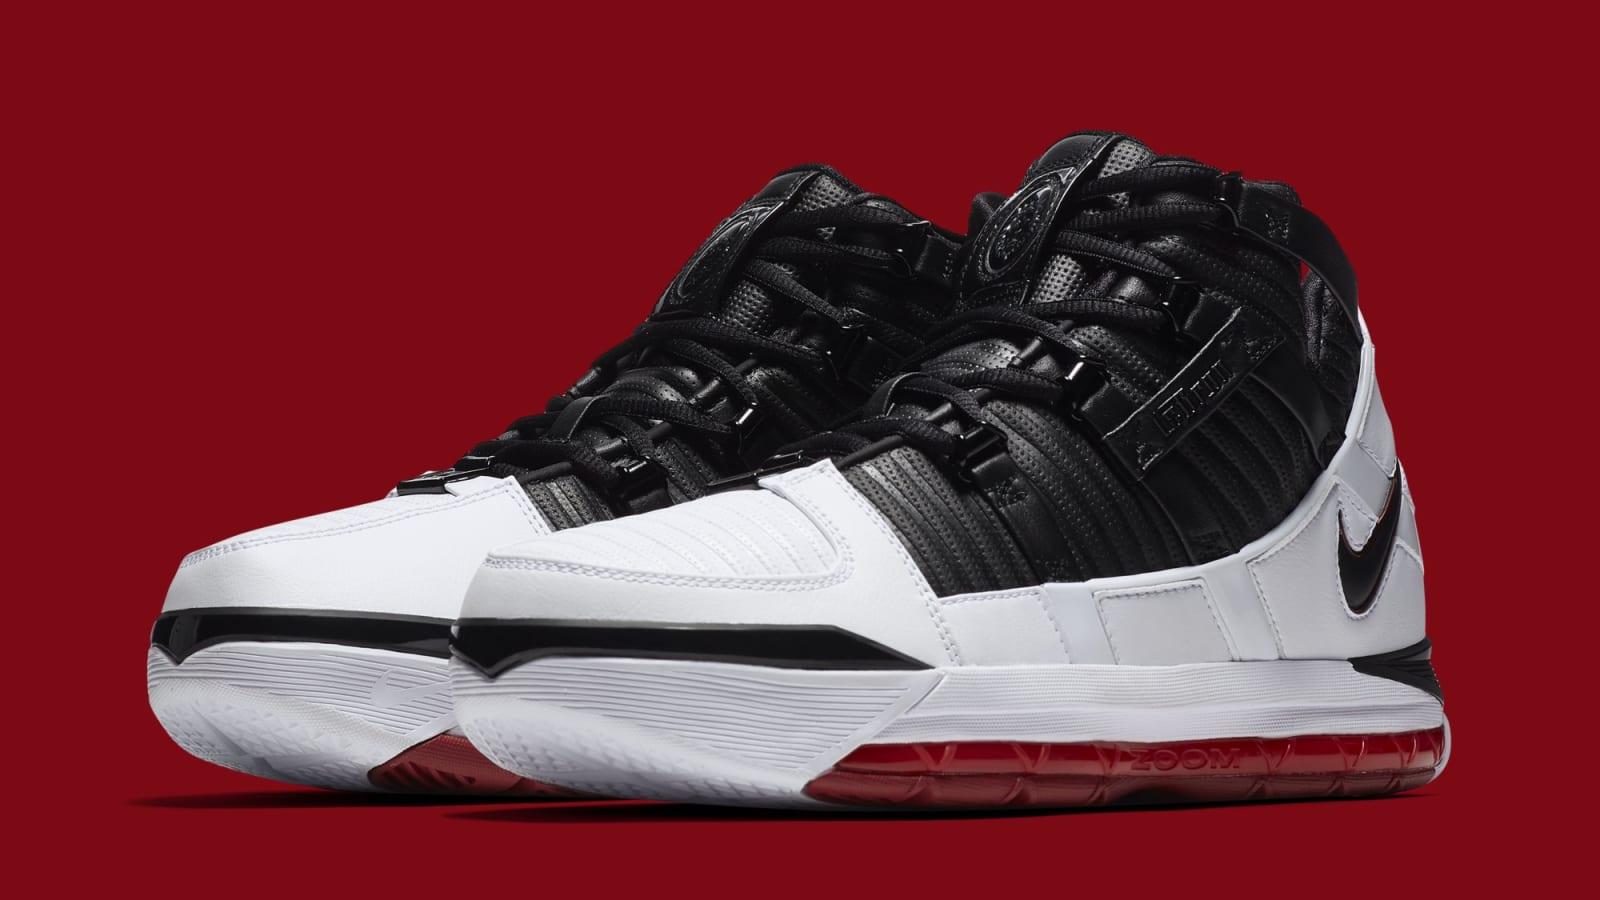 97a54c4bdcafda Nike Zoom LeBron 3  quot Home quot  Official s   Release Details